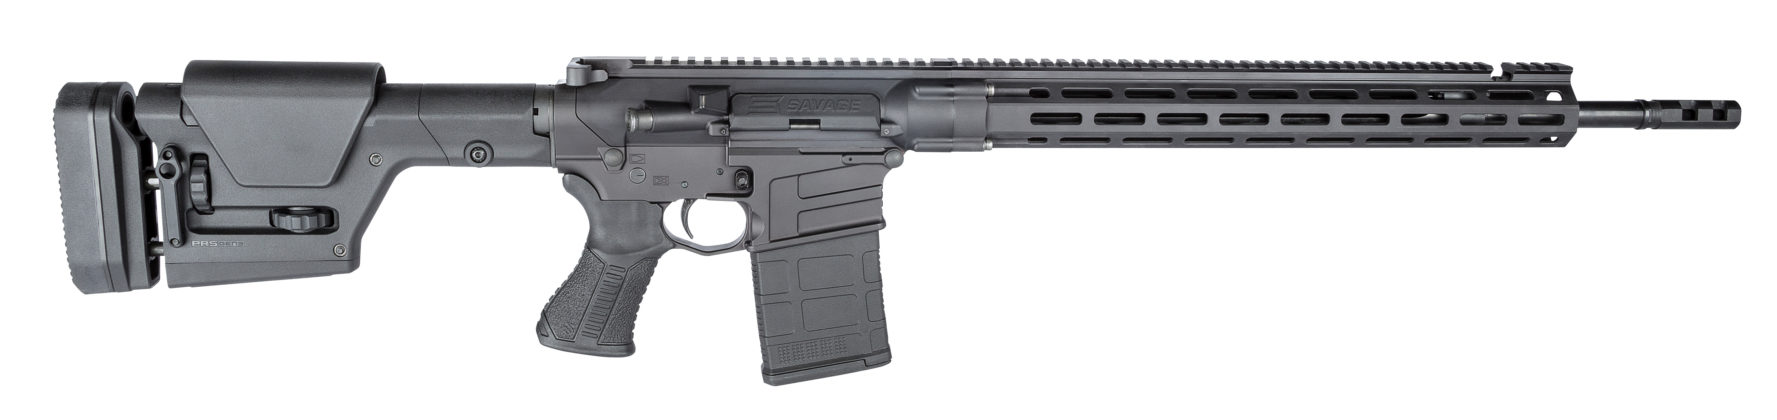 MSR 10 Long Range Savage